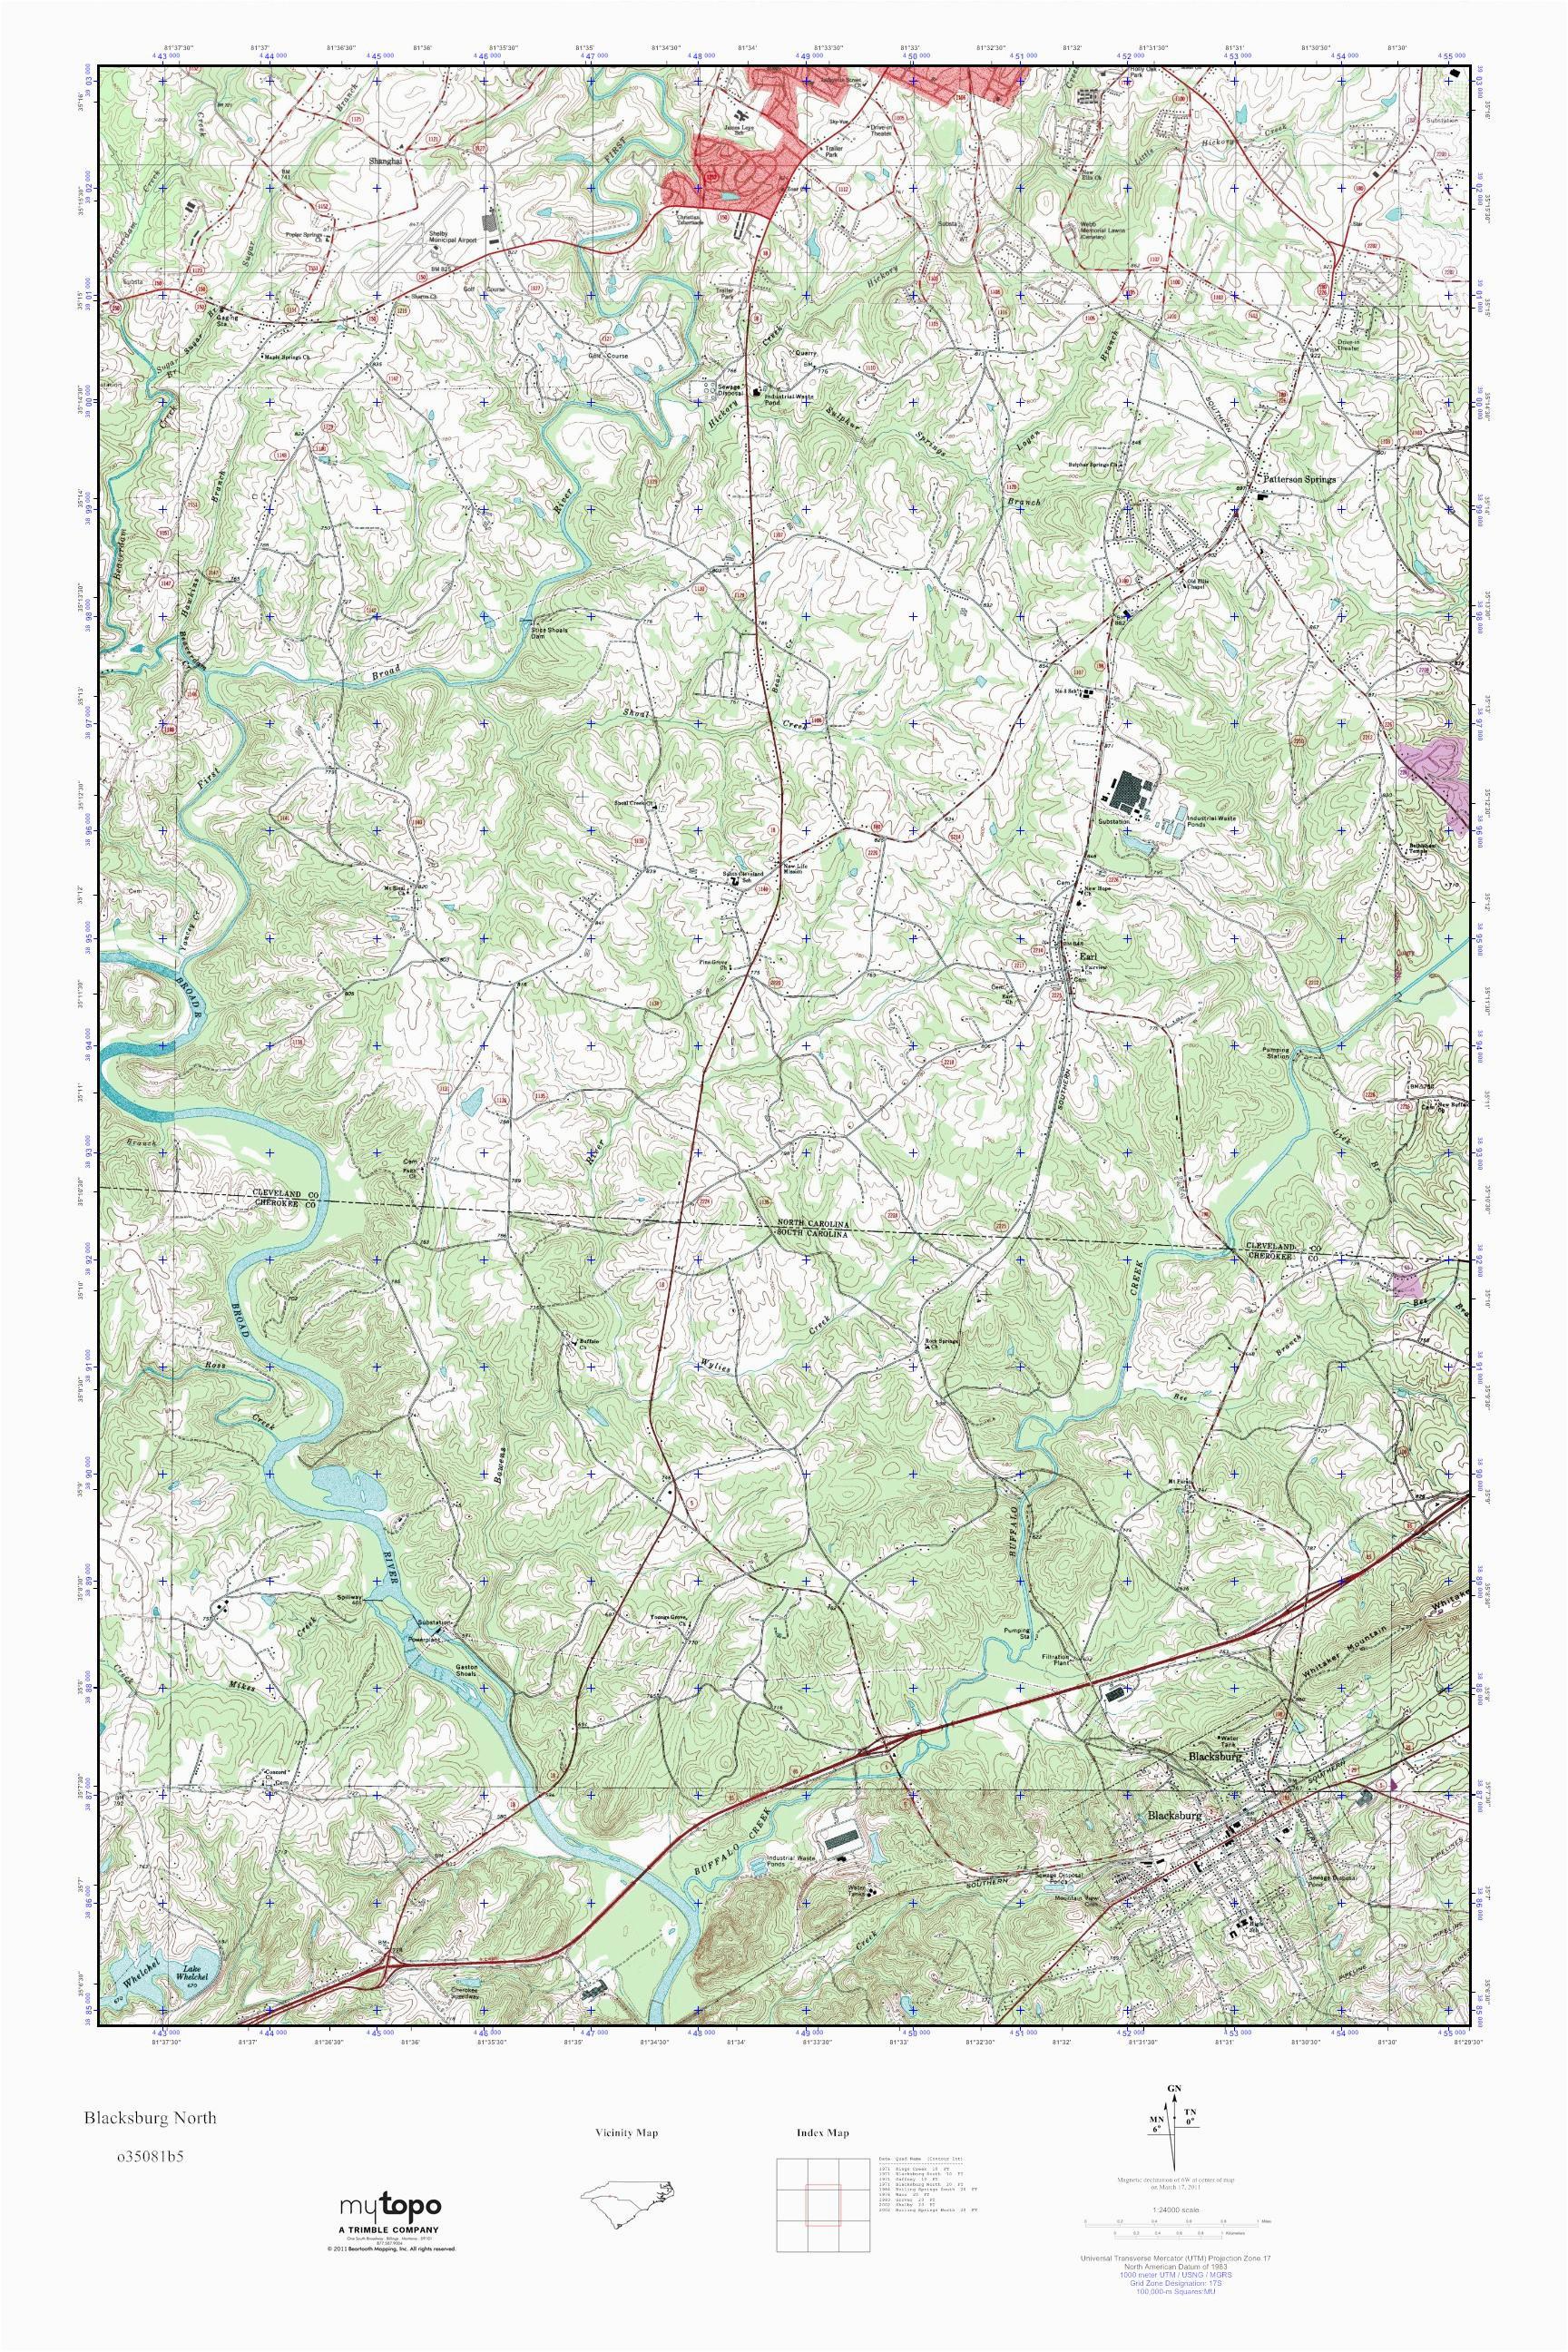 mytopo blacksburg north south carolina usgs quad topo map